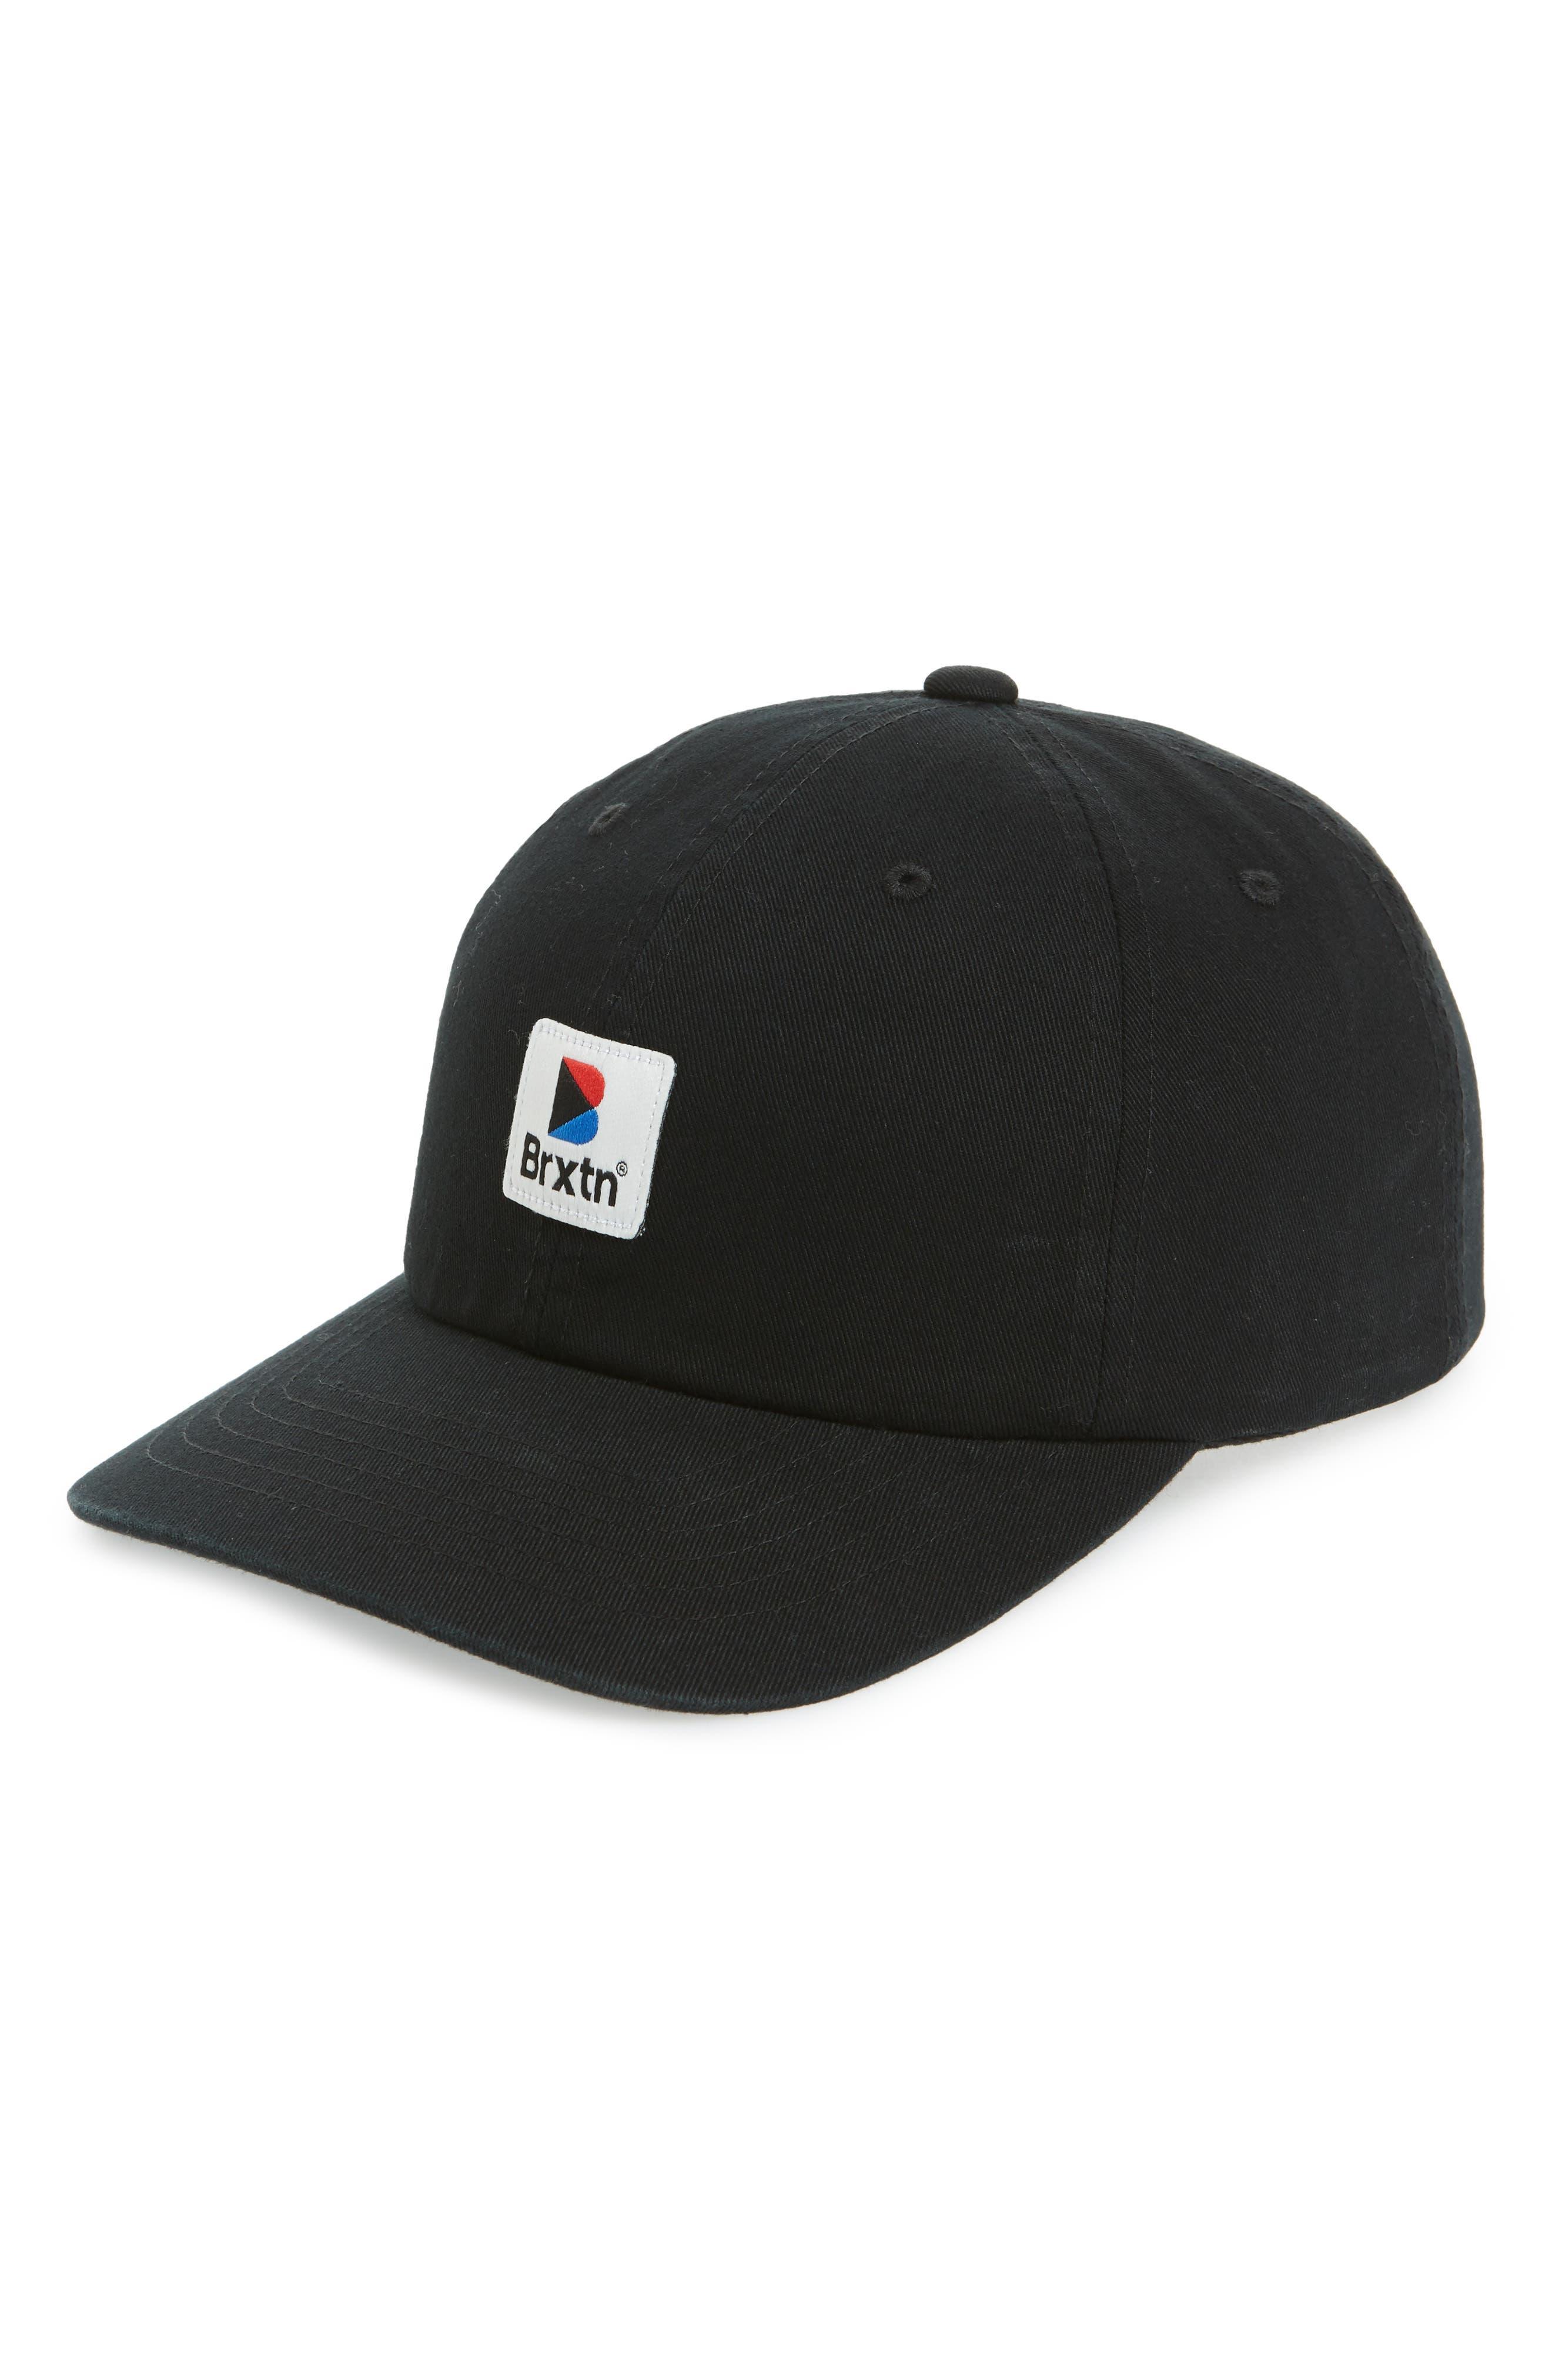 Stowell Baseball Cap,                         Main,                         color, Black